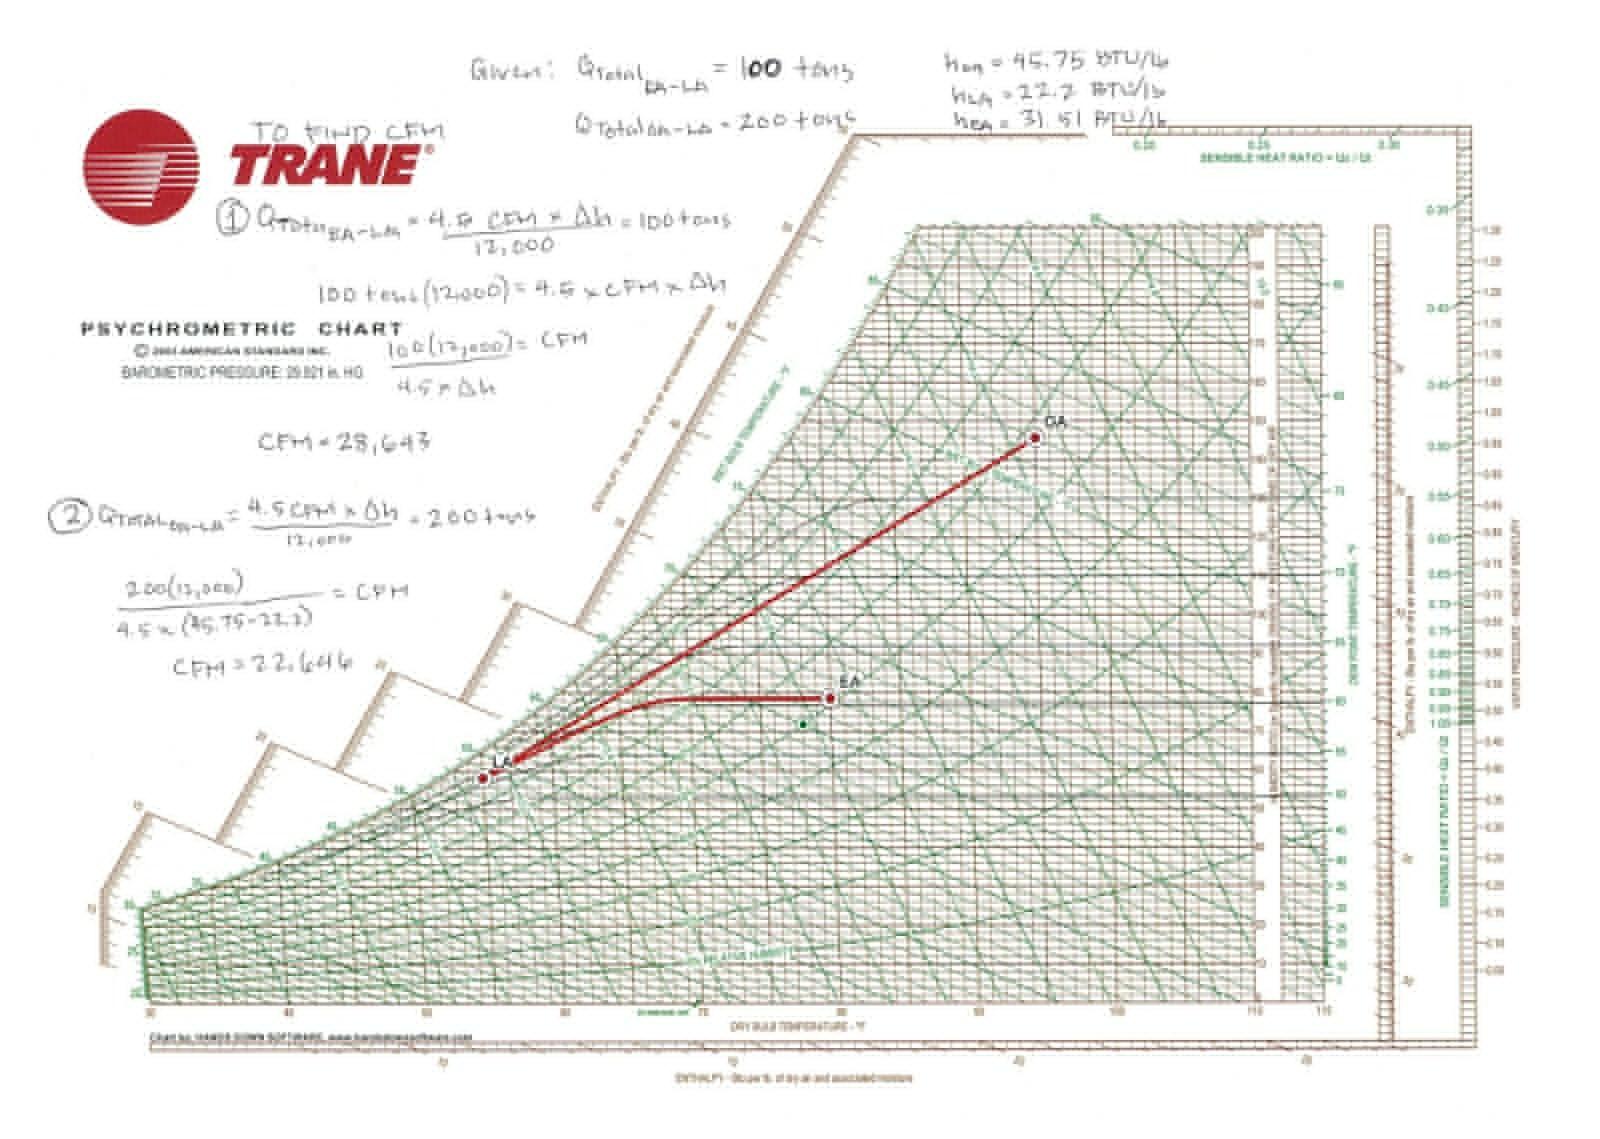 Trane Psychrometric Chart Free Download – Eratae - Printable Psychrometric Chart Free